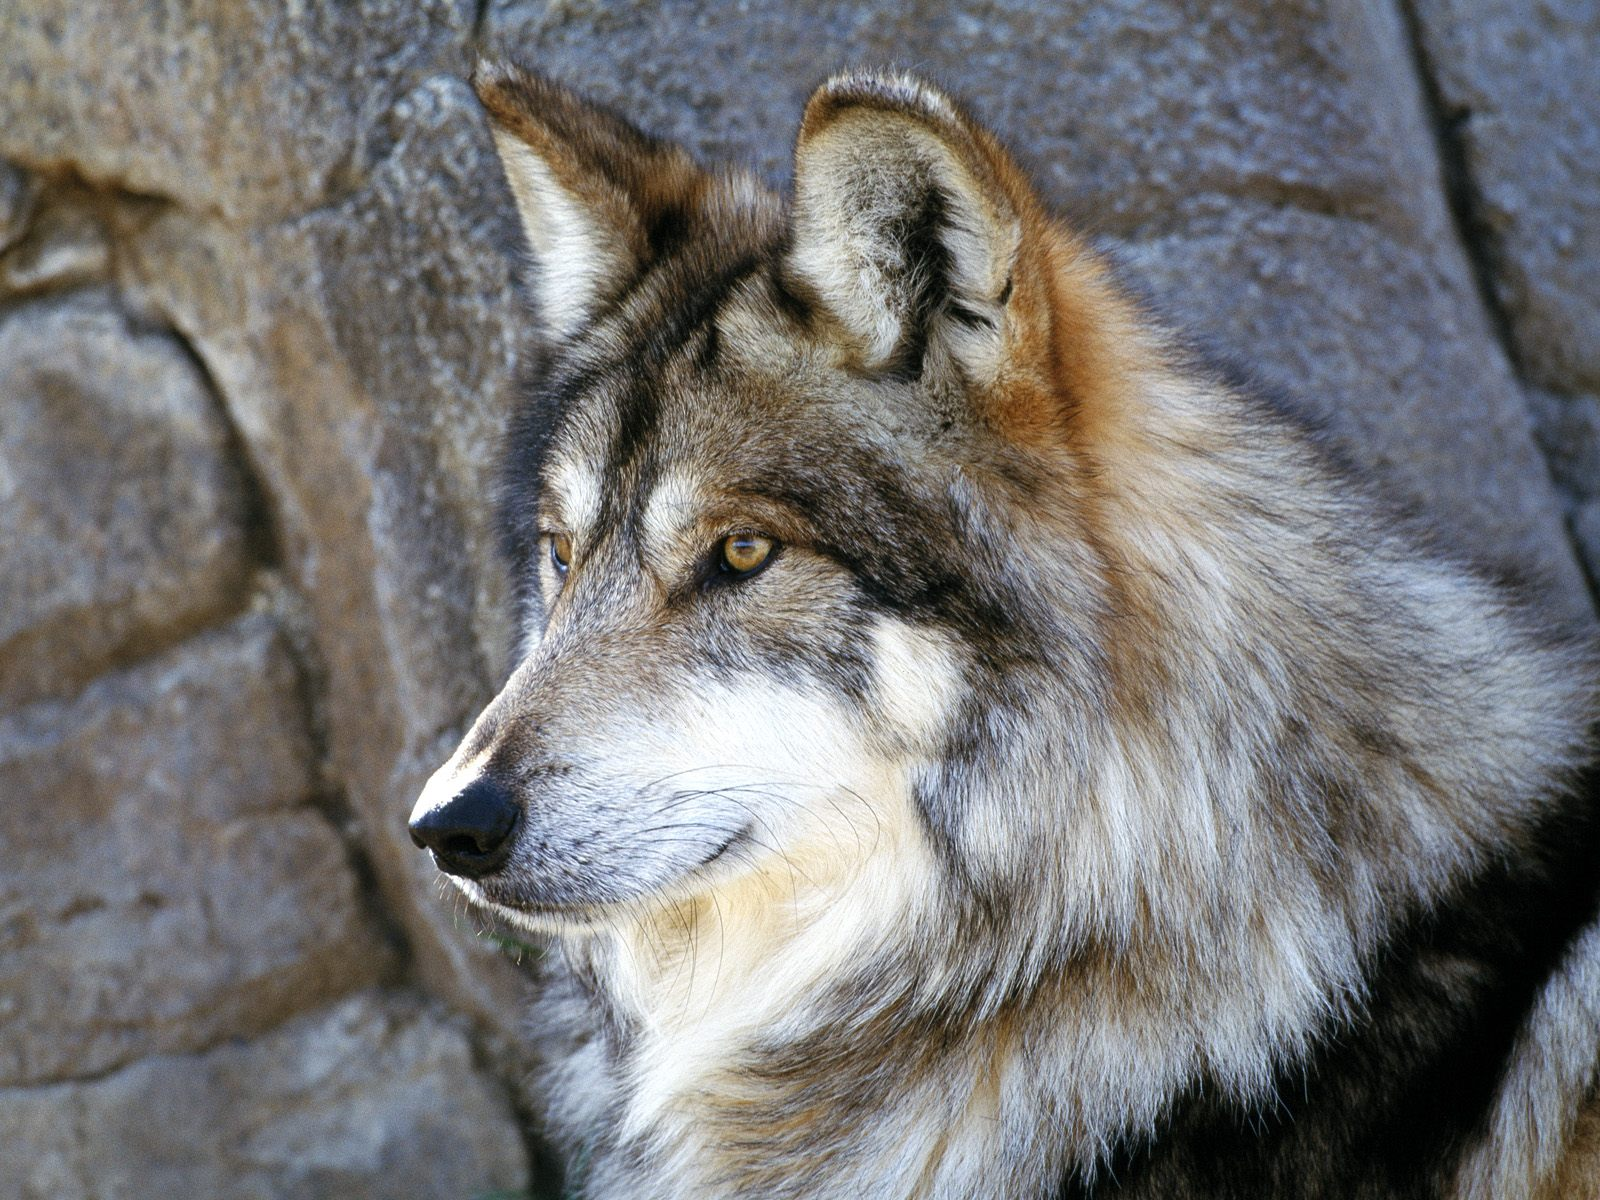 gambar hewan - foto serigala hitam